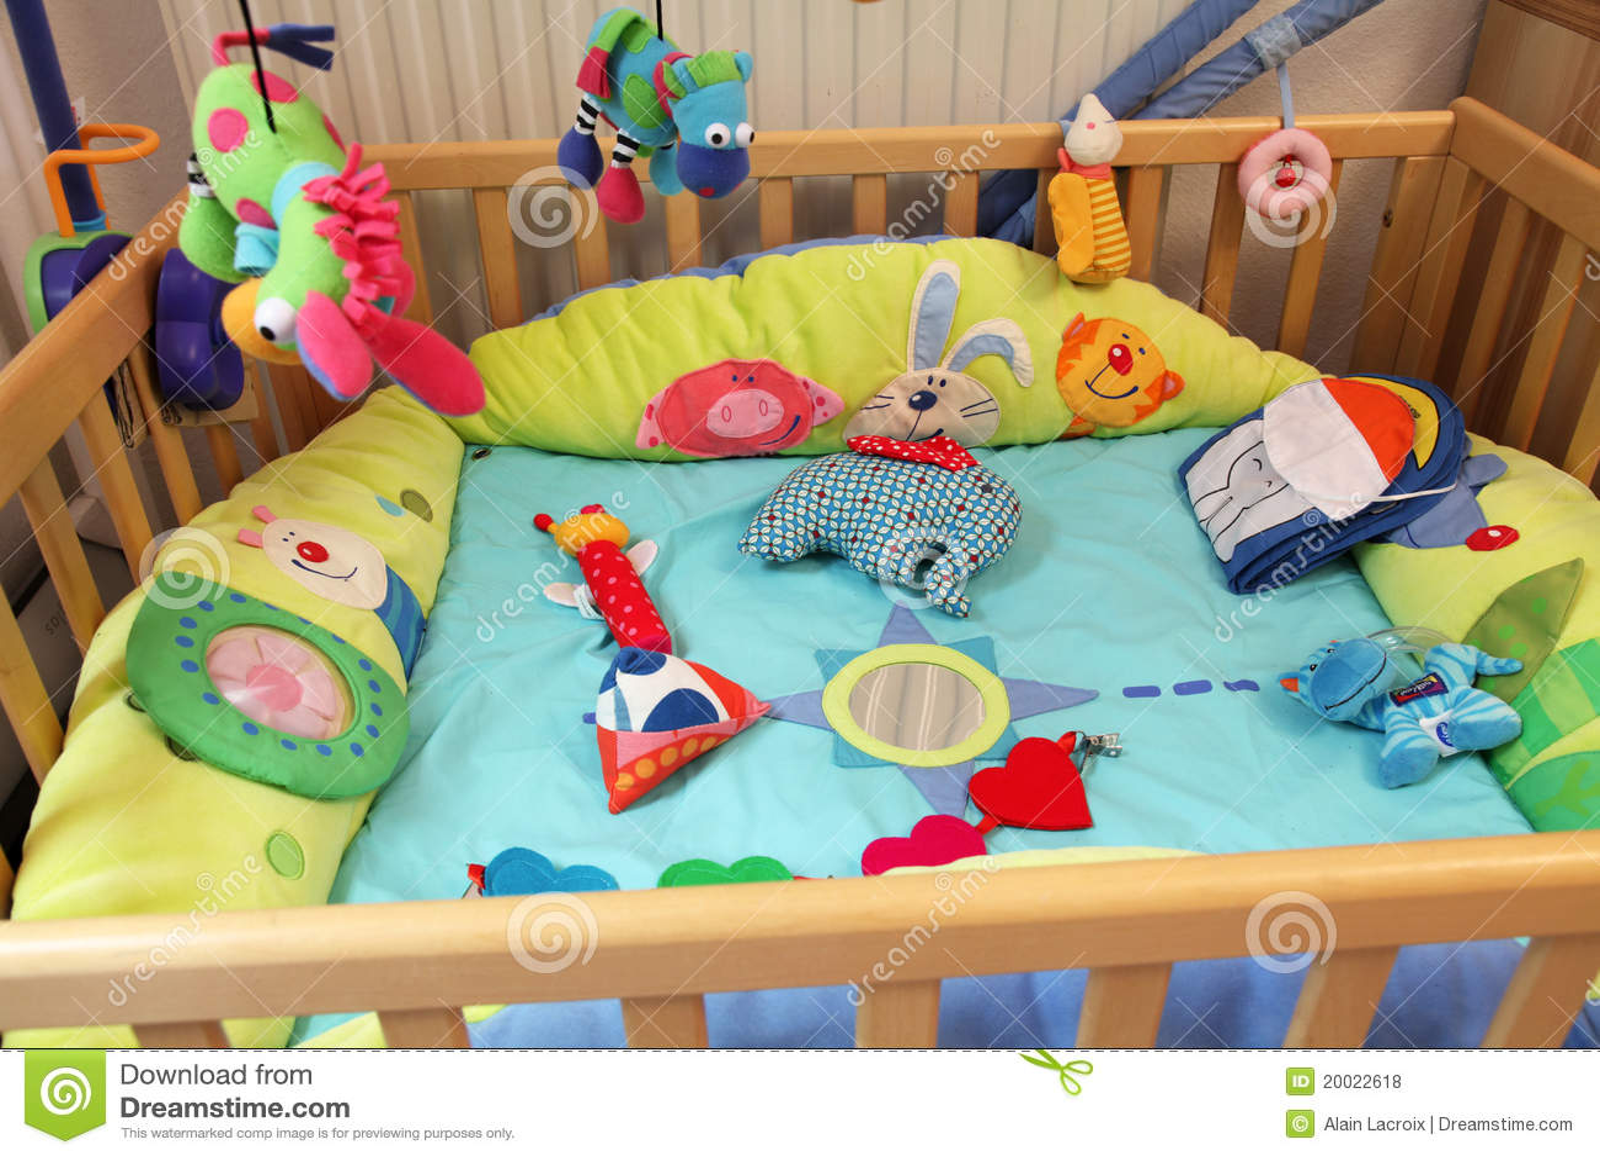 Baby Park Royalty Free Stock Photos Image 20022618